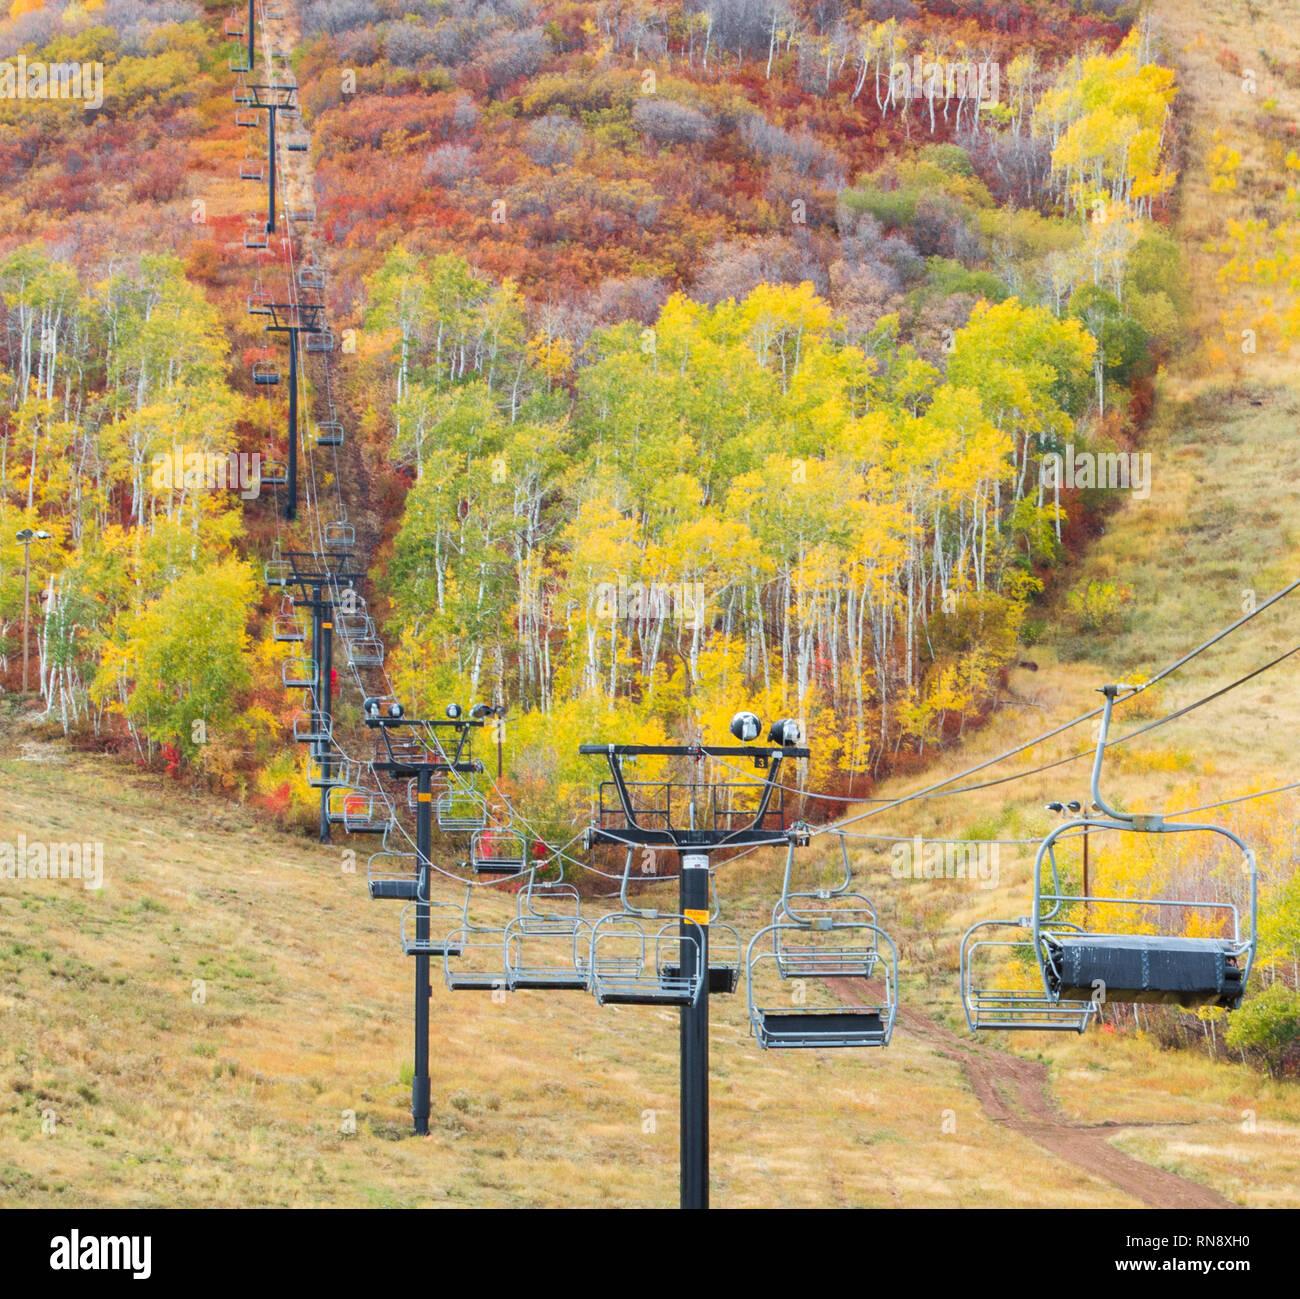 empty mountain ski lift amid lush trees with vivid autumn colors near Park City, Utah - Stock Image